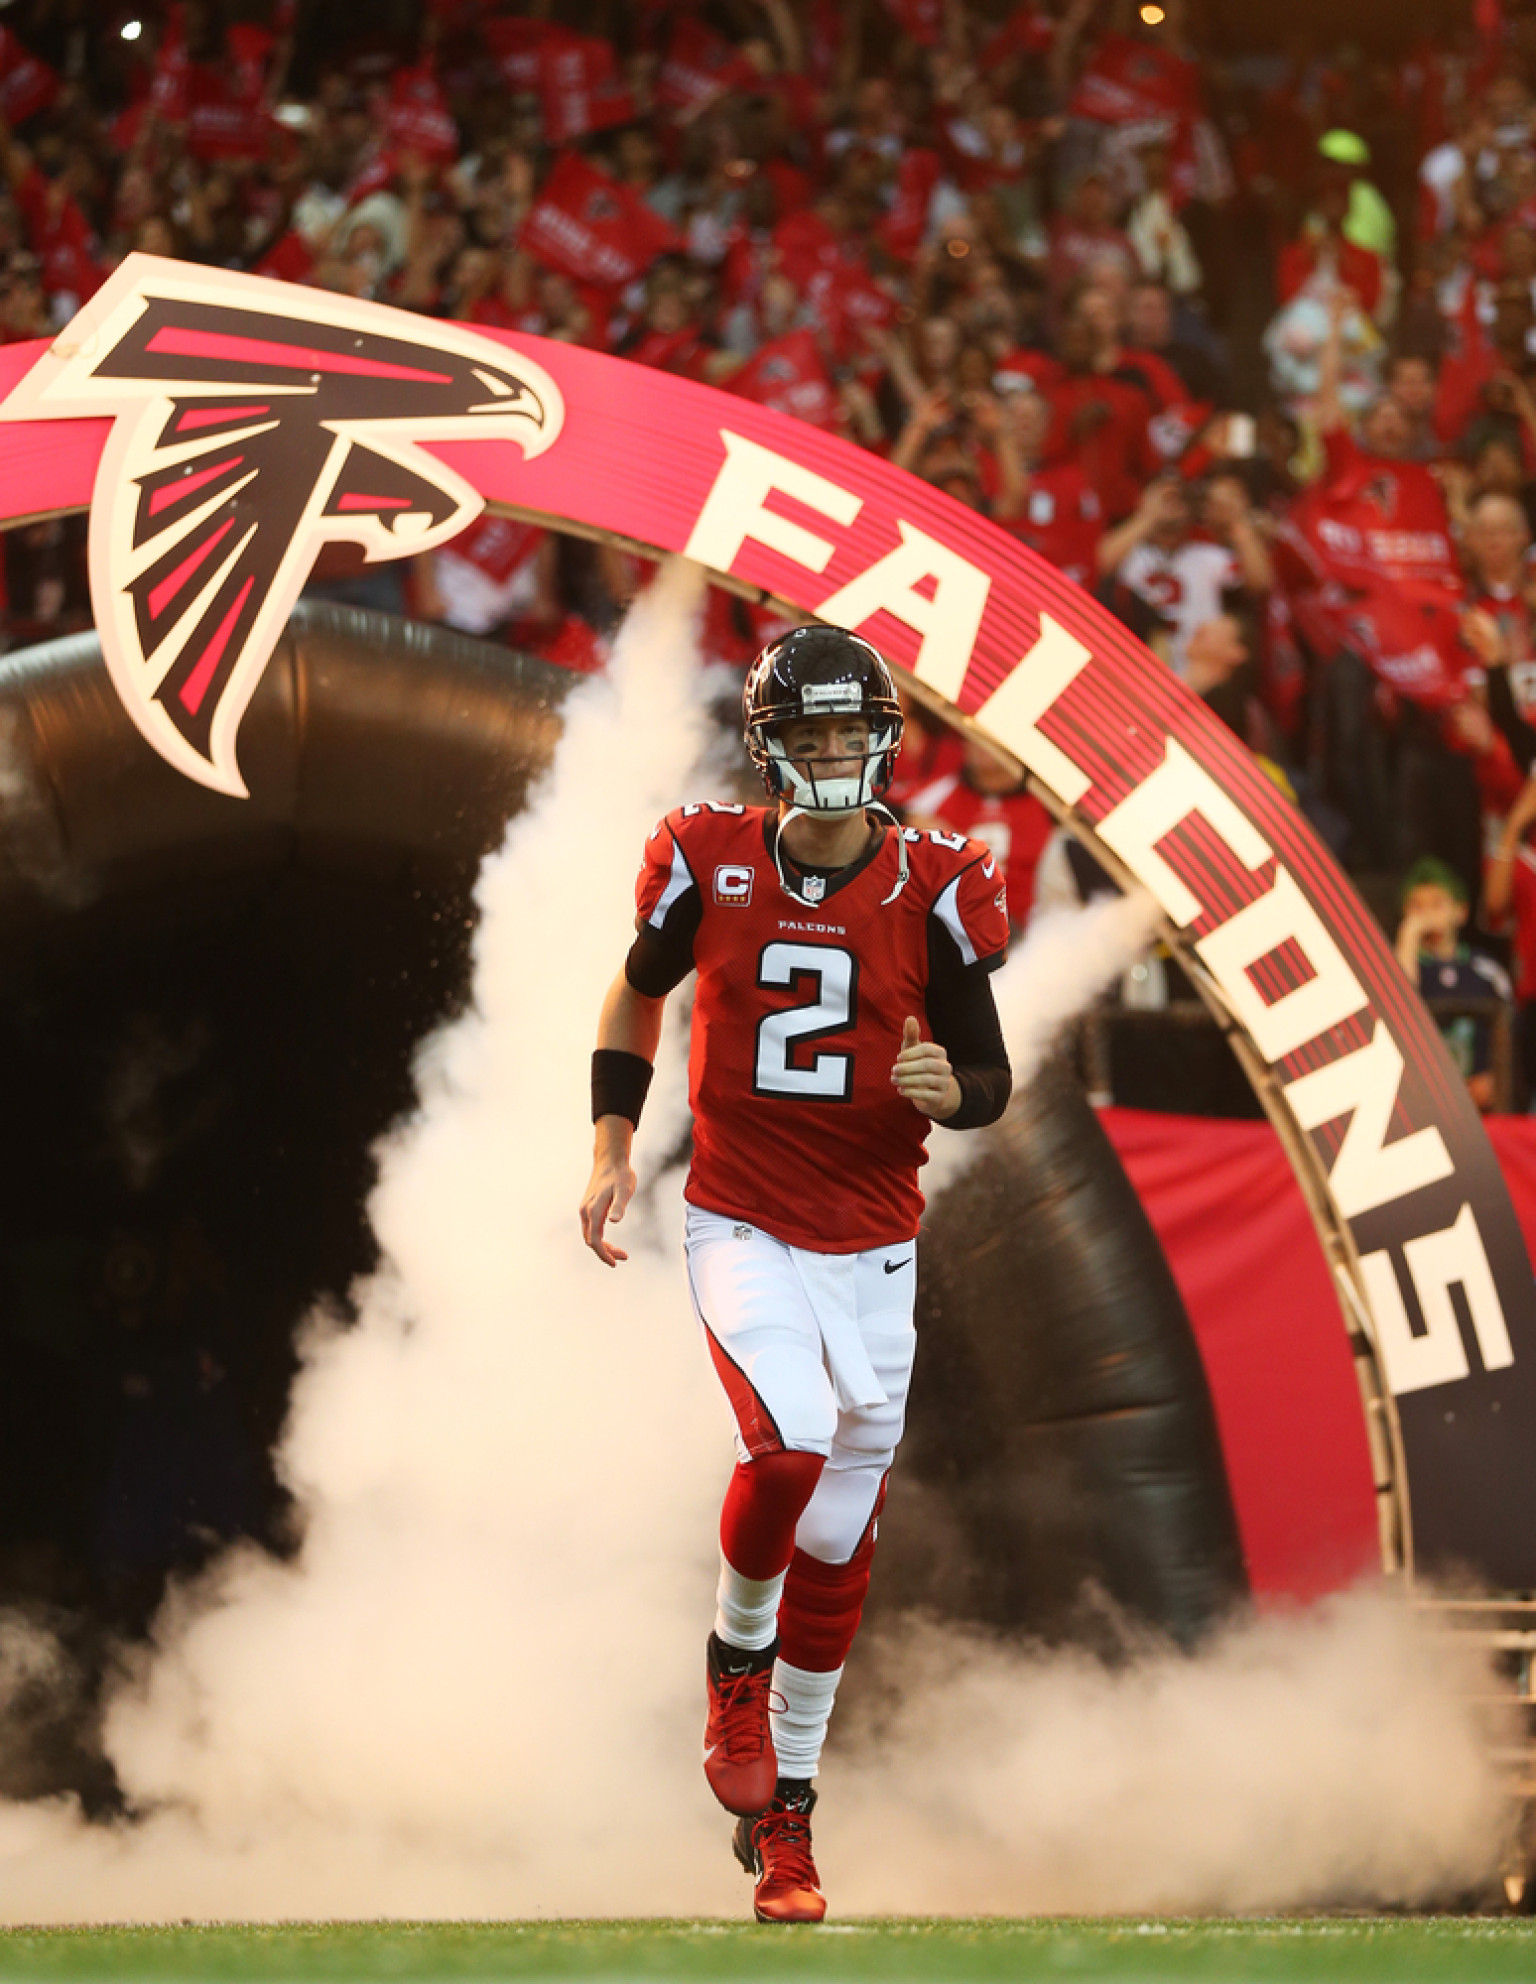 Matt Ryan Contract Extension An In Depth Look Inside The Falcons